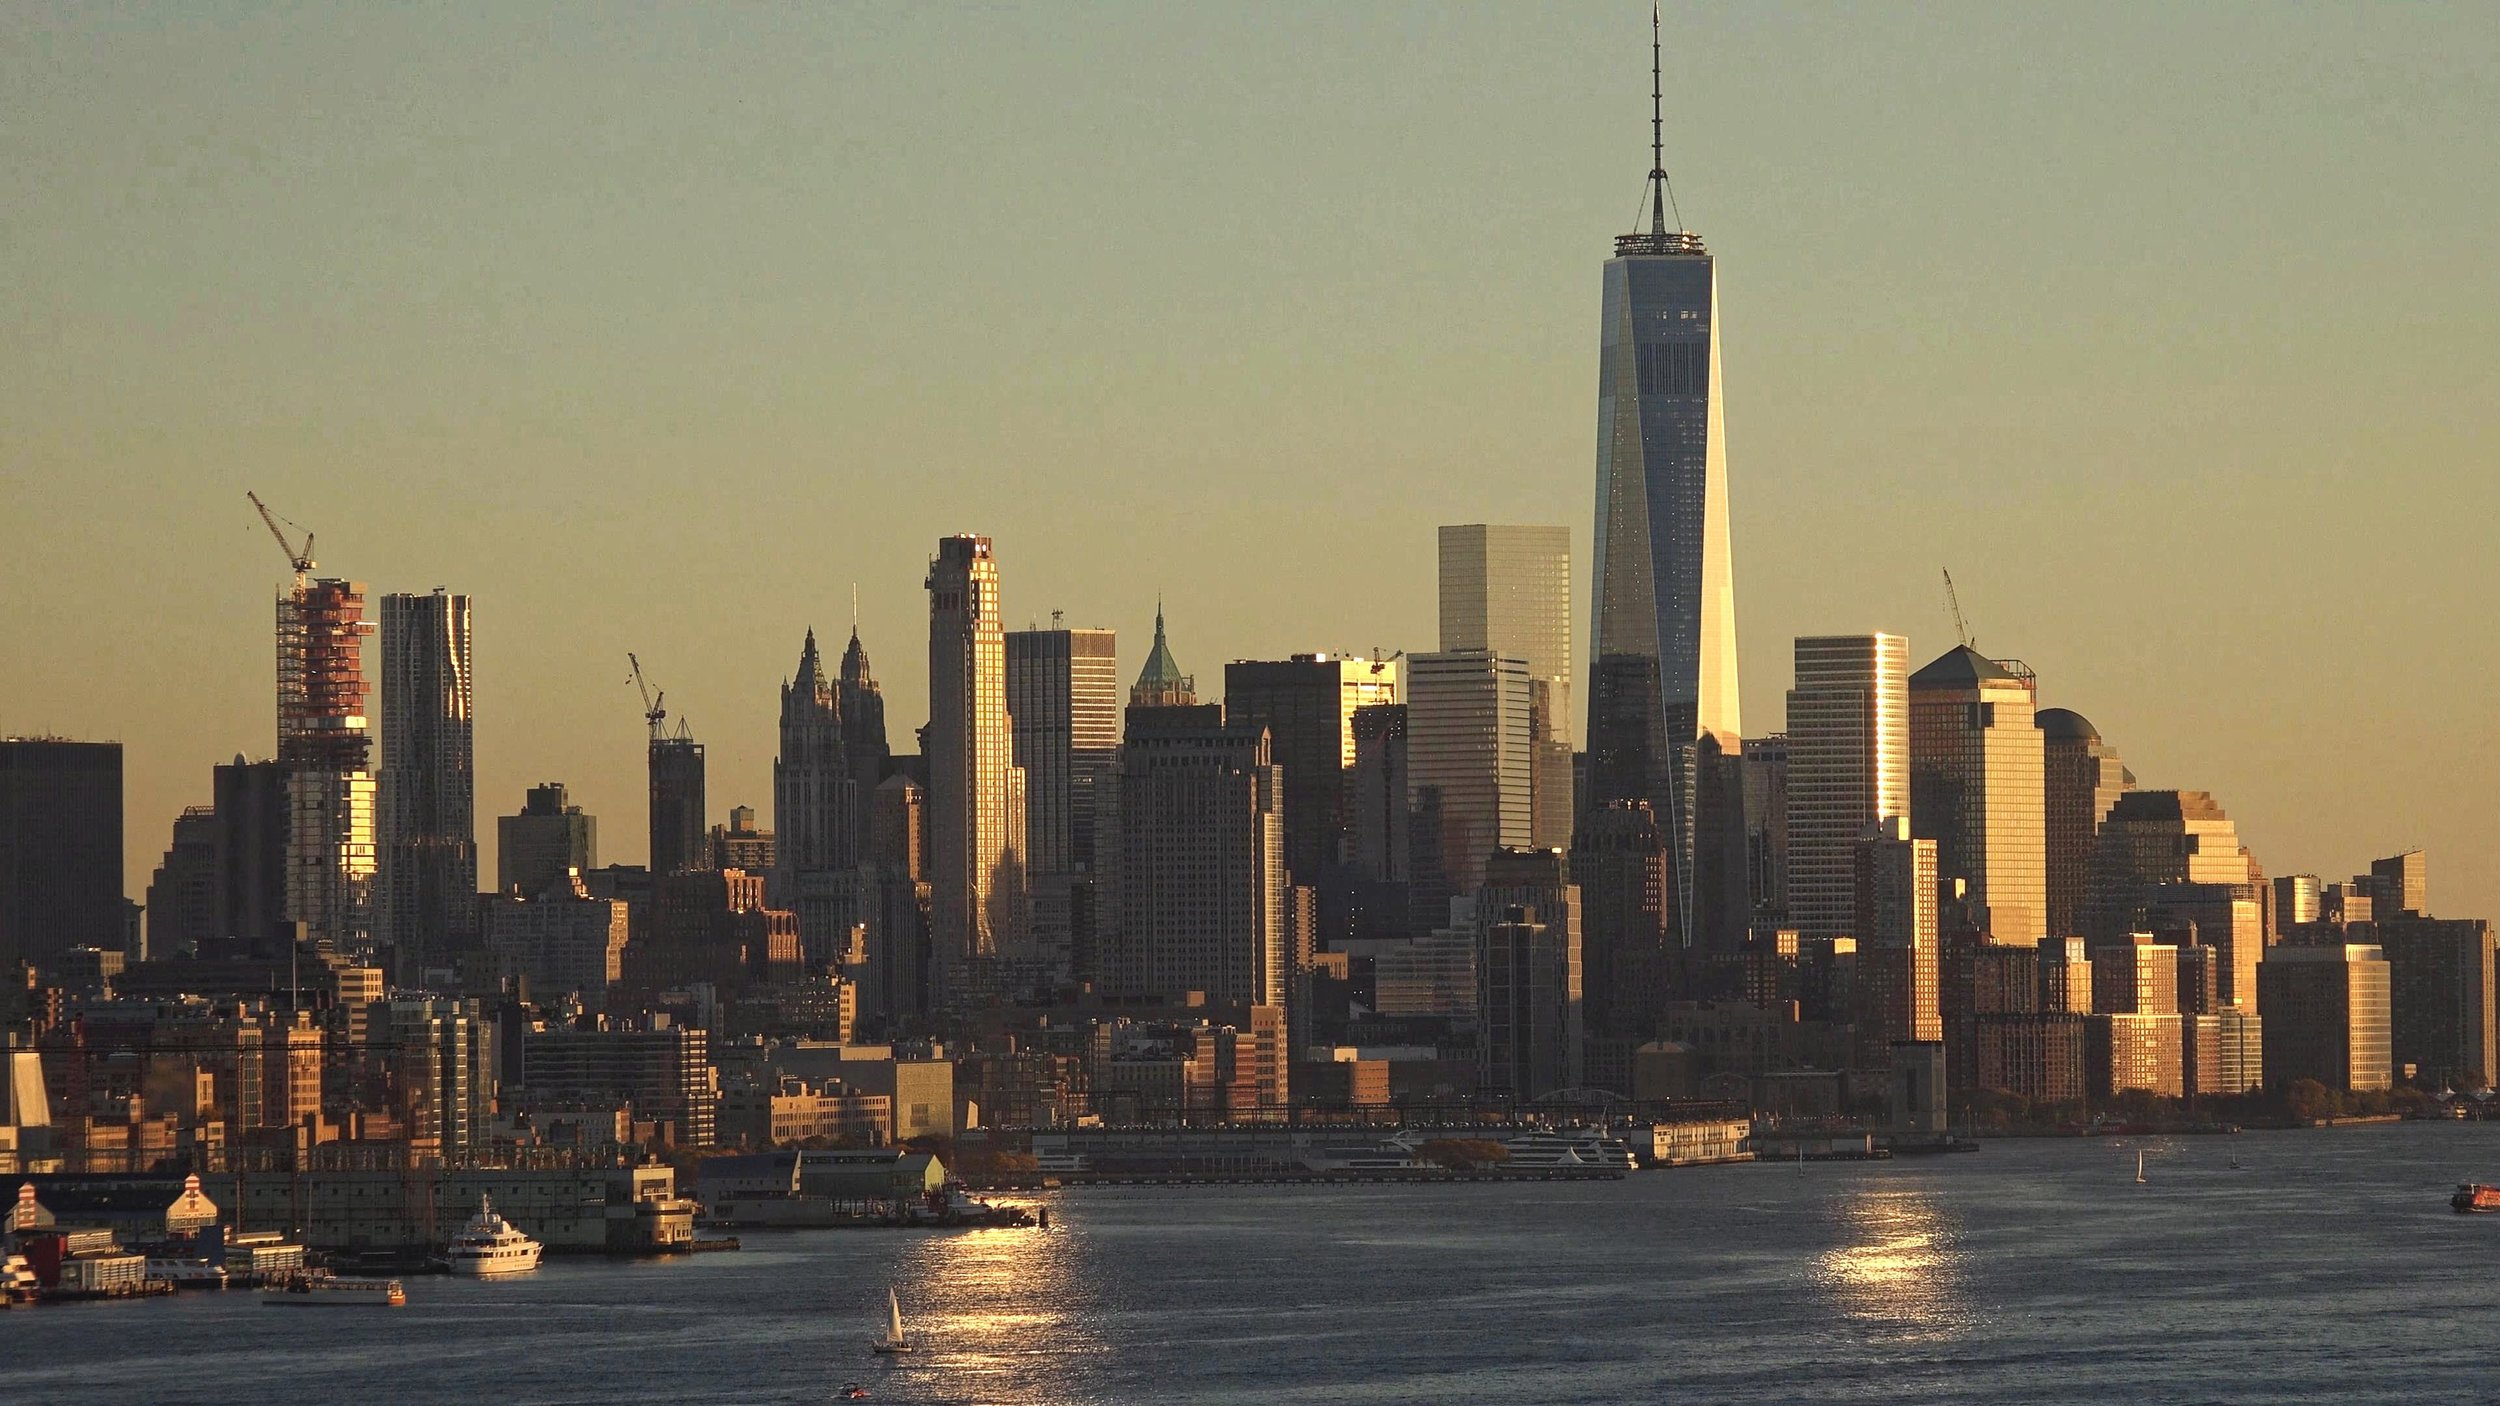 New York City, NY  Please contact Jennifer Pazdon for more information ( j.pazdon@castconnex.com ).